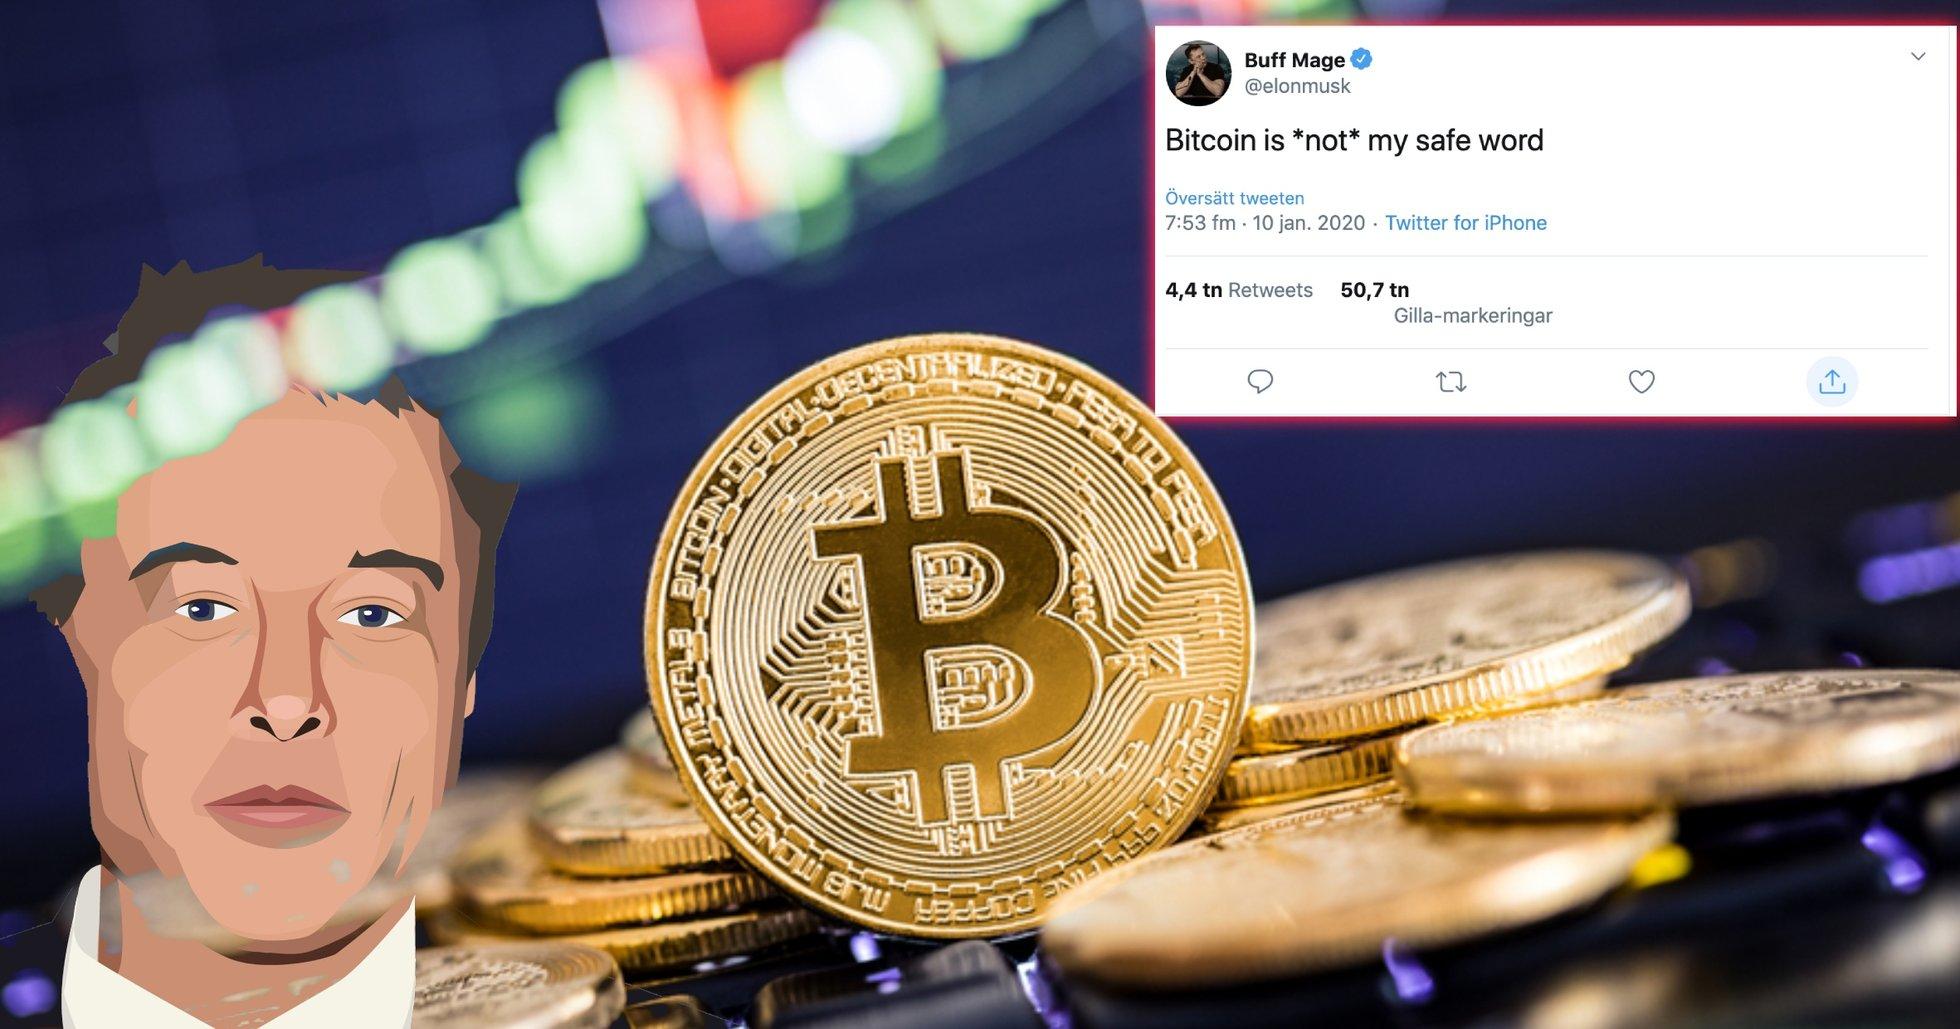 Tesla-grundaren Elon Musk skriver kryptisk sex-tweeet om bitcoin